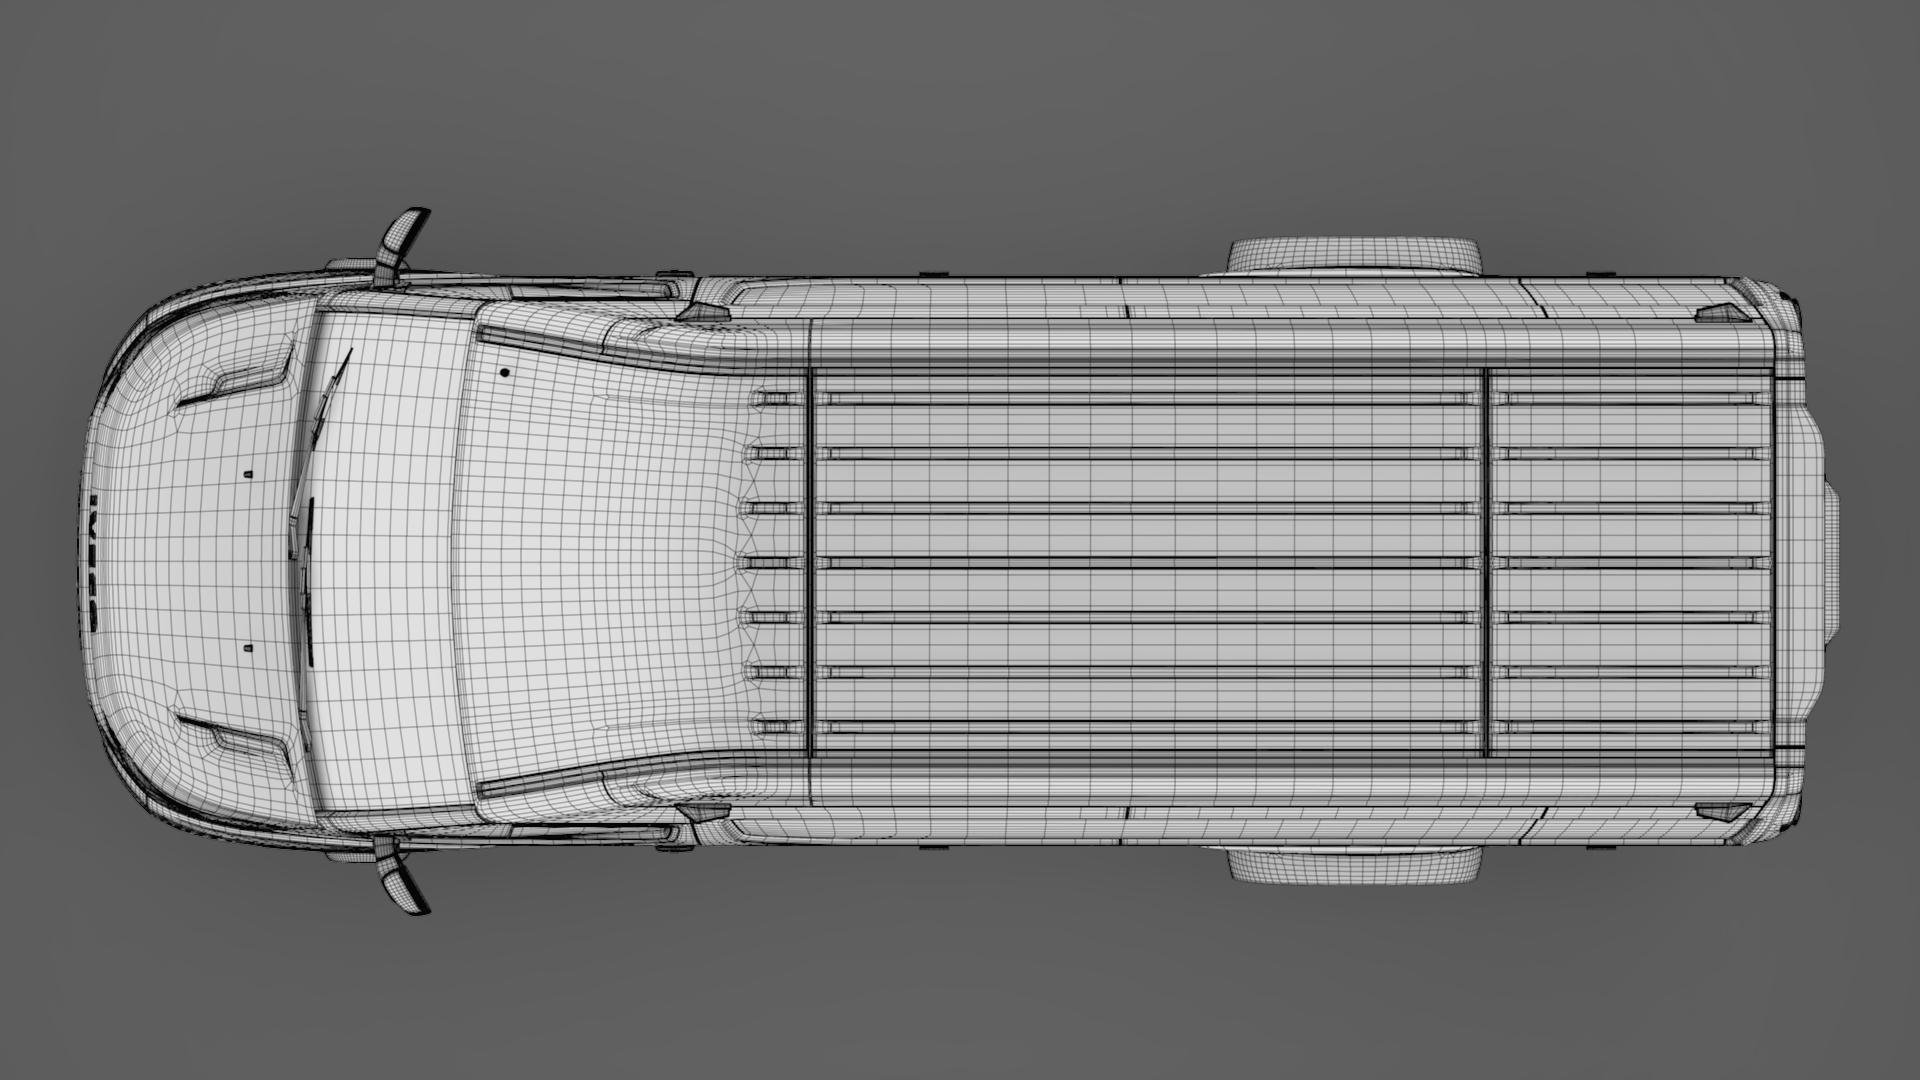 iveco daily minibus l3h3 2017 3d model max fbx c4d lwo ma mb hrc xsi obj 276160